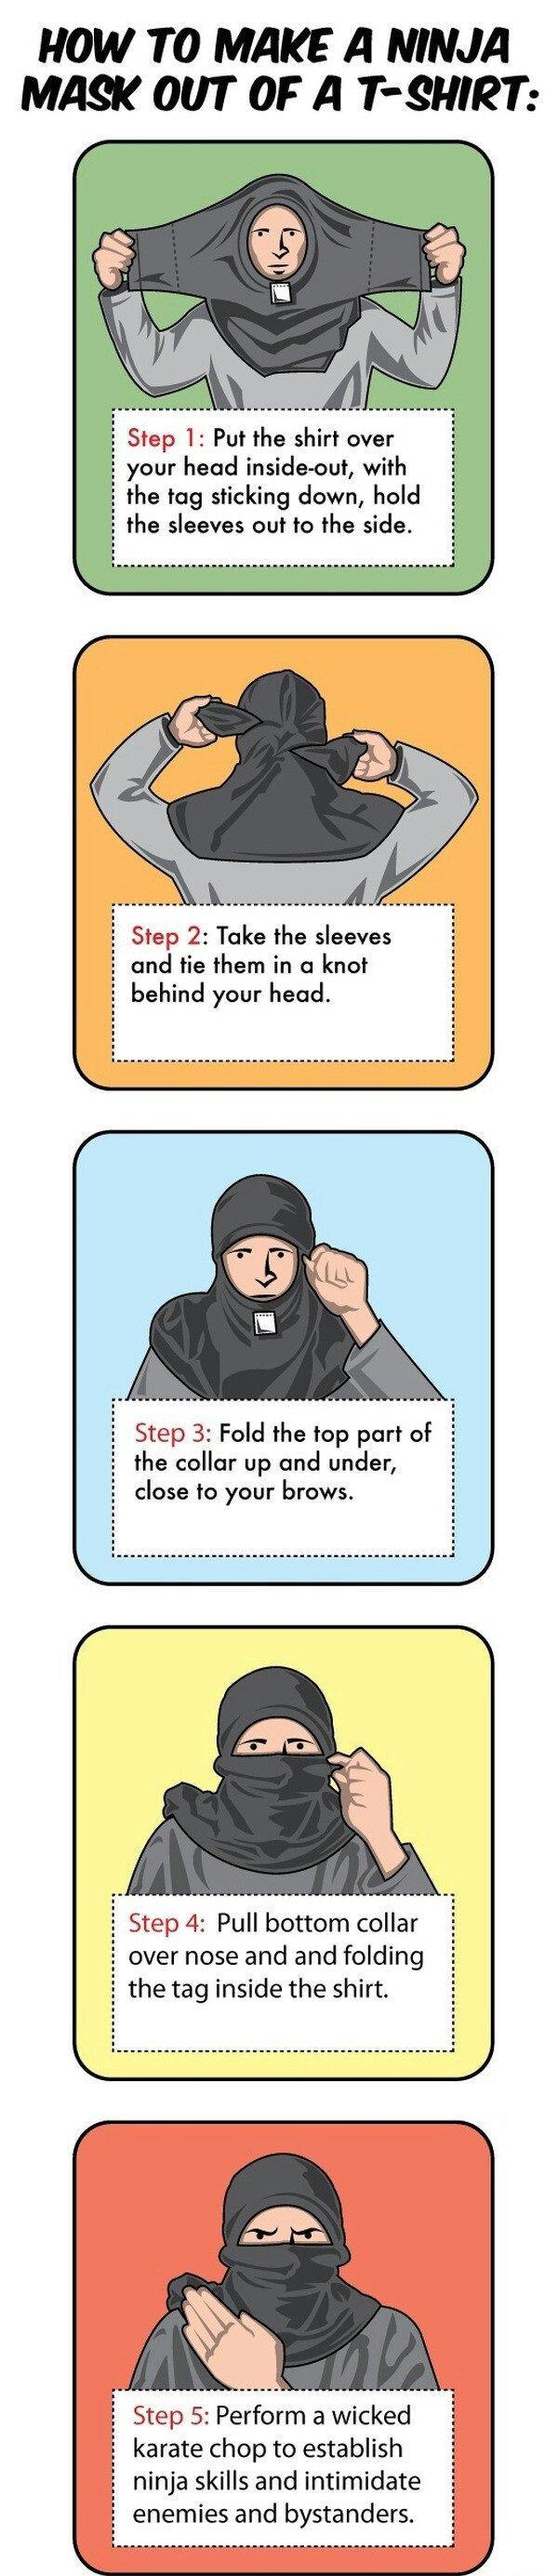 ninja mask Ninja mask, Laugh, Funny memes